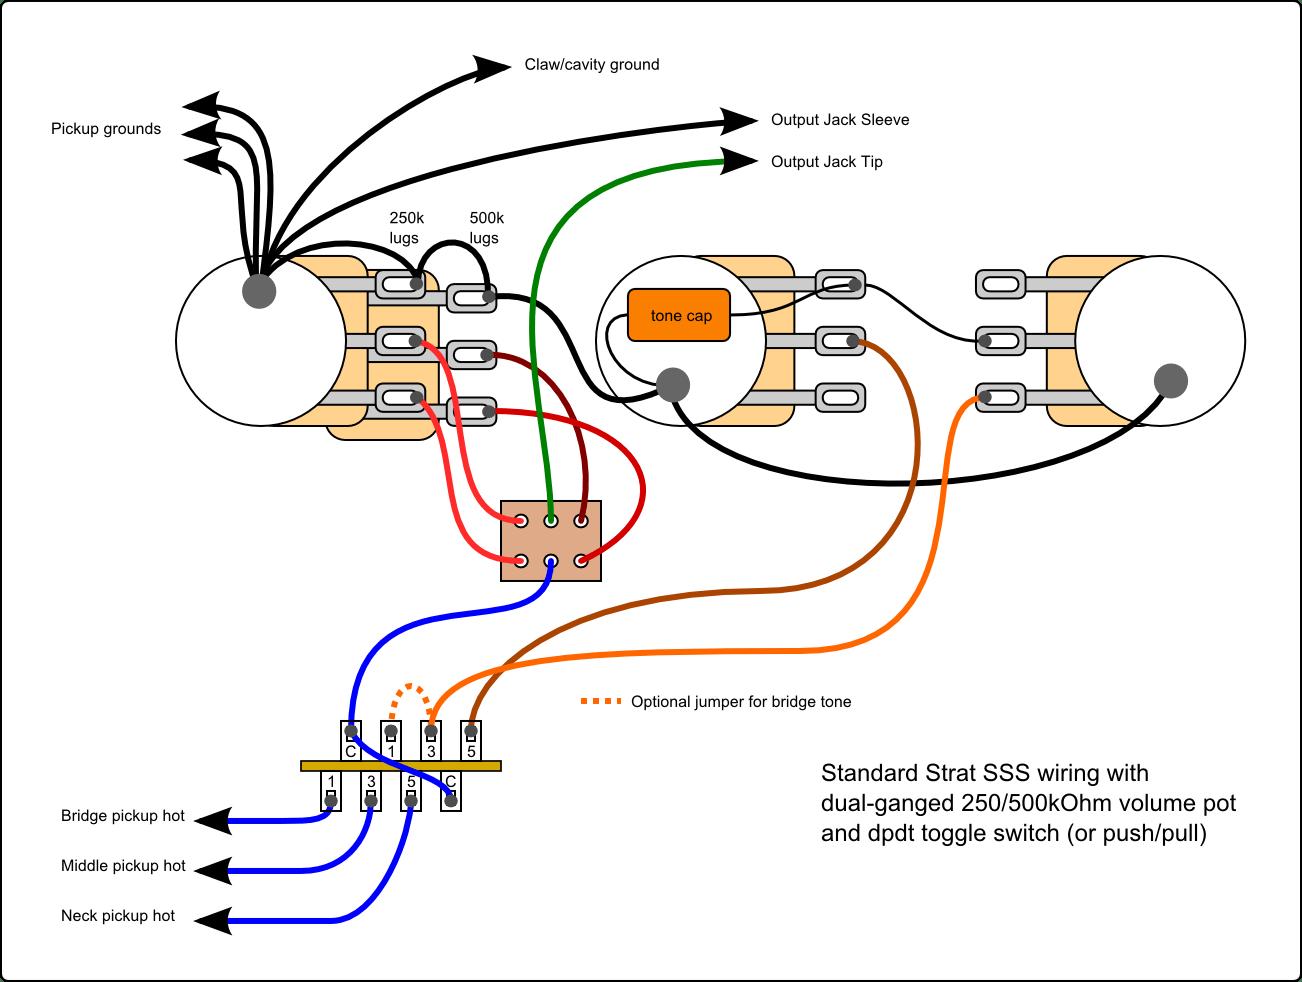 medium resolution of stratocaster wiring diagram 500k pots wiring diagram for rh bestbreweries co david gilmour strat wiring diagram fender squier strat wiring diagram